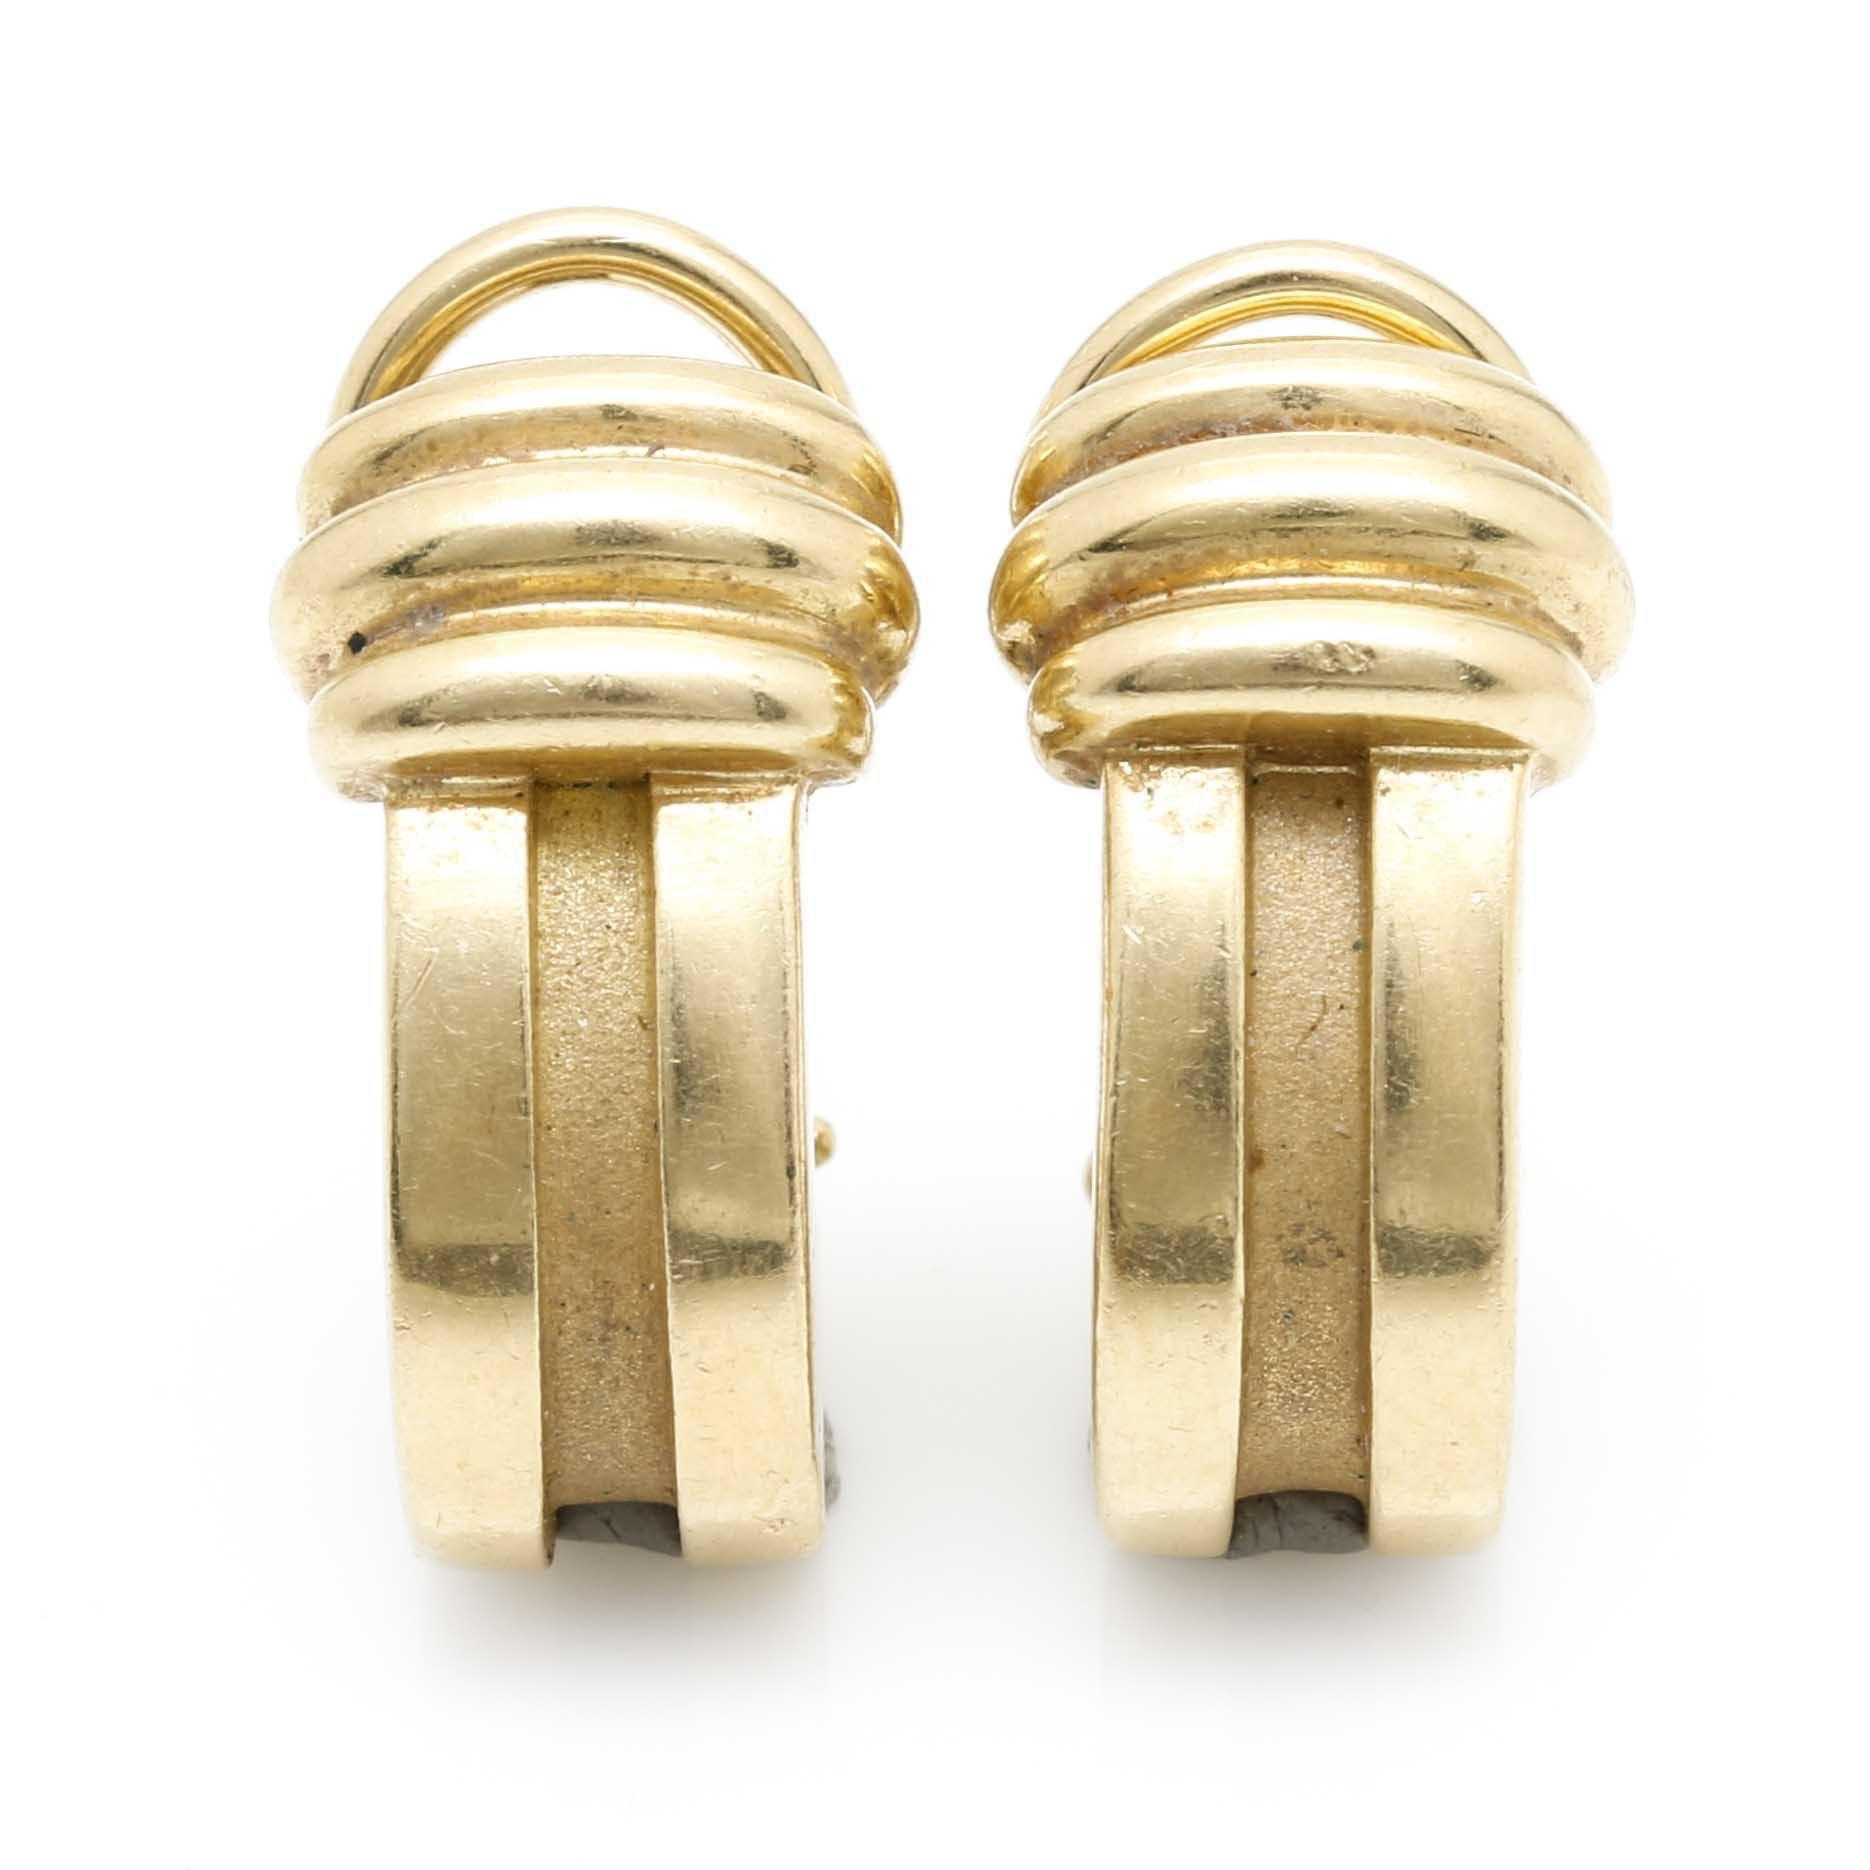 Tiffany & Co. 18K Yellow Gold Clip-On Earrings